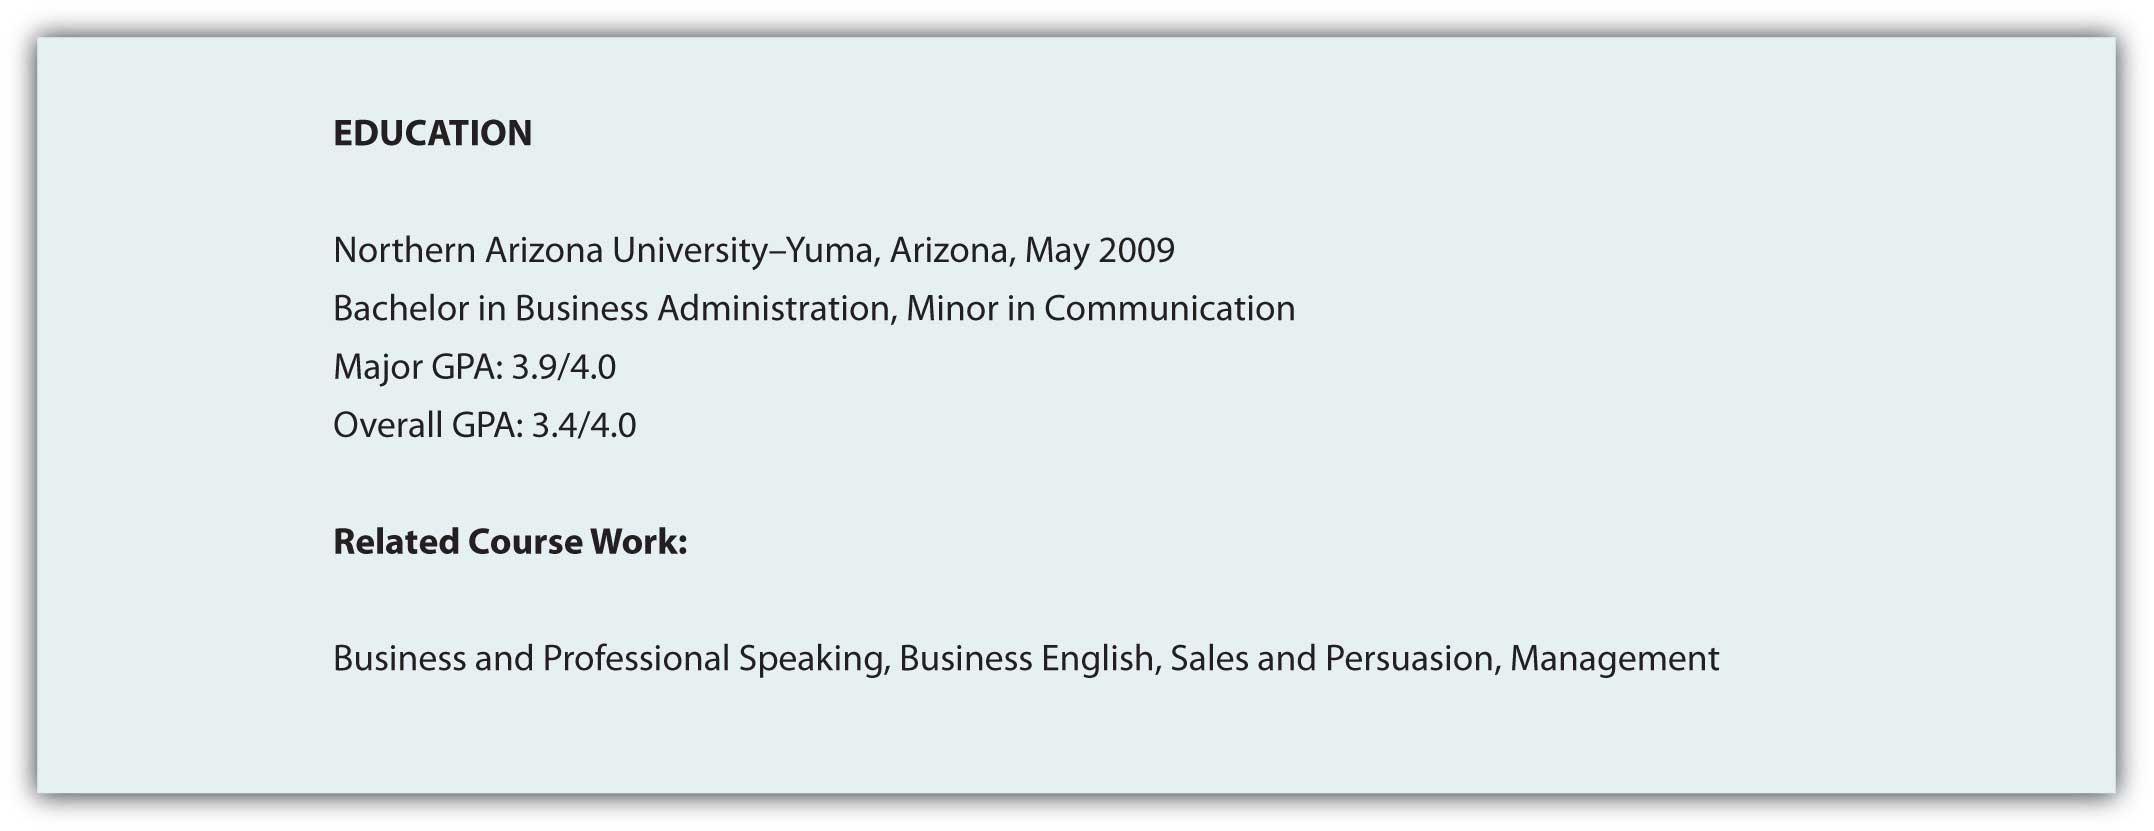 resume relevant coursework sample